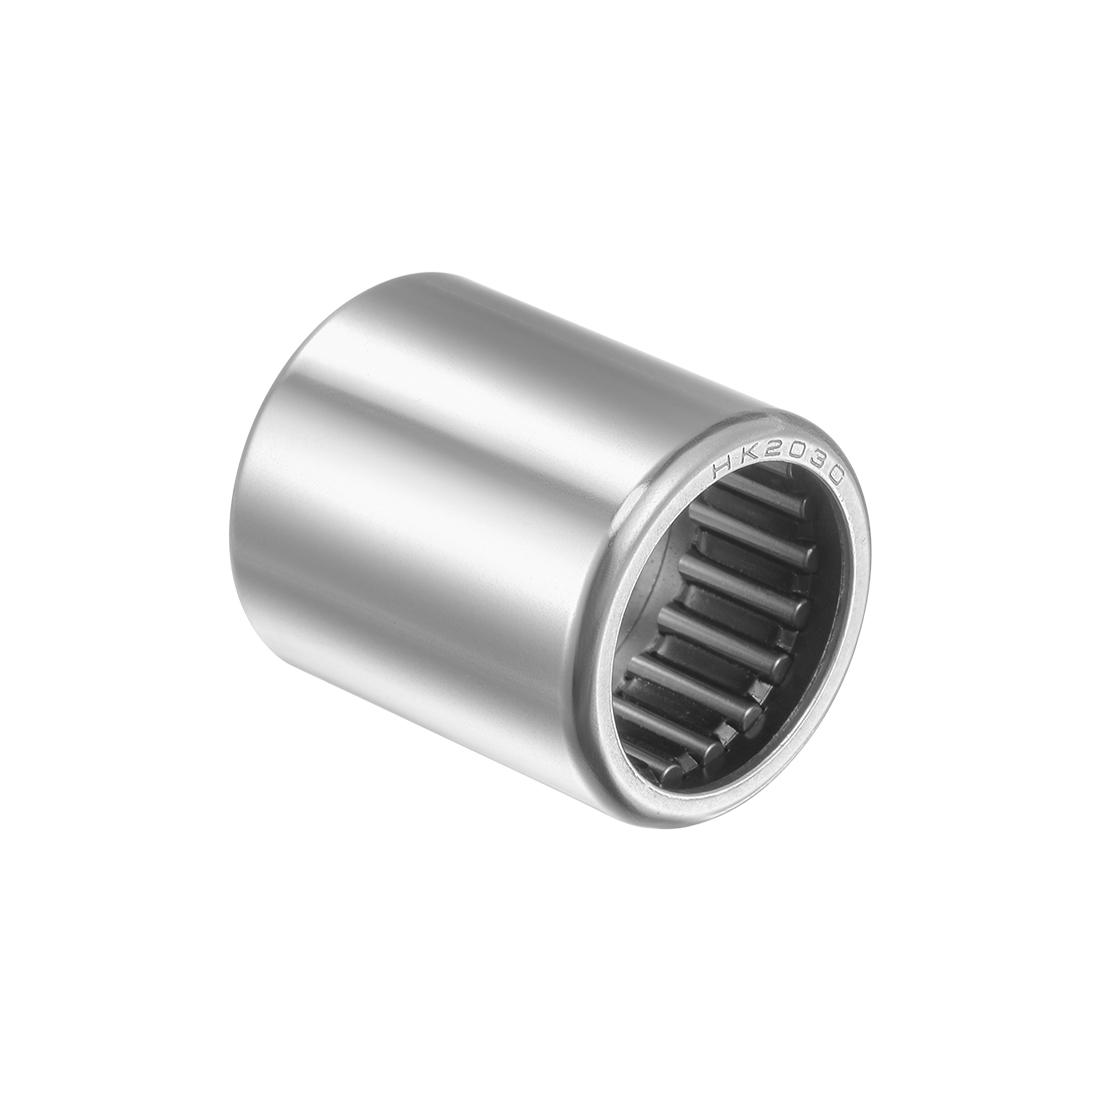 HK2030 Drawn Cup Needle Roller Bearings 20mm Bore, 26mm OD, 30mm Width